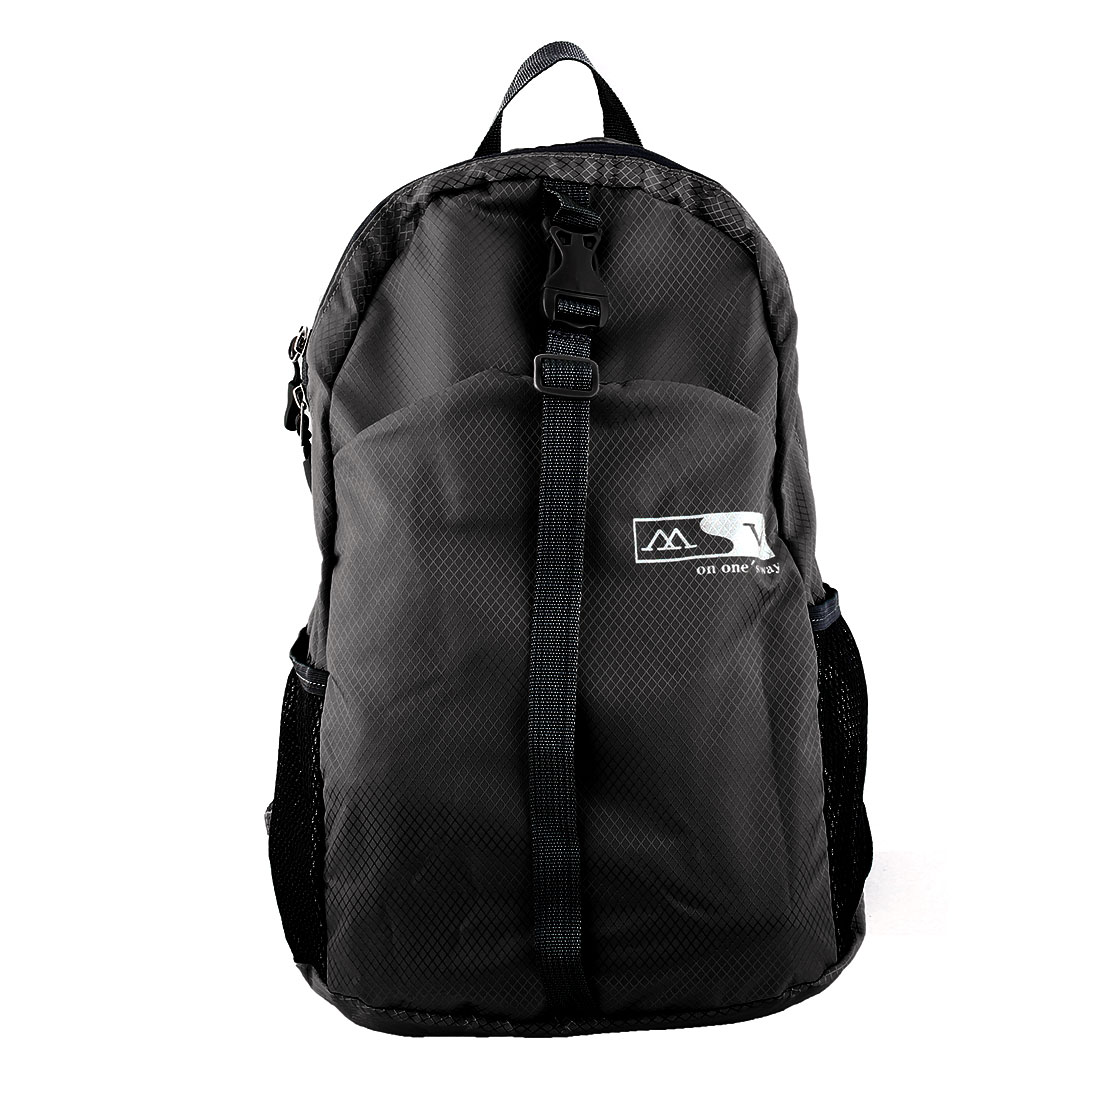 Lightweight Foldable Pack Hiking Camping Daypack Water Resistant Travel Backpack Sport Bag Black 20L